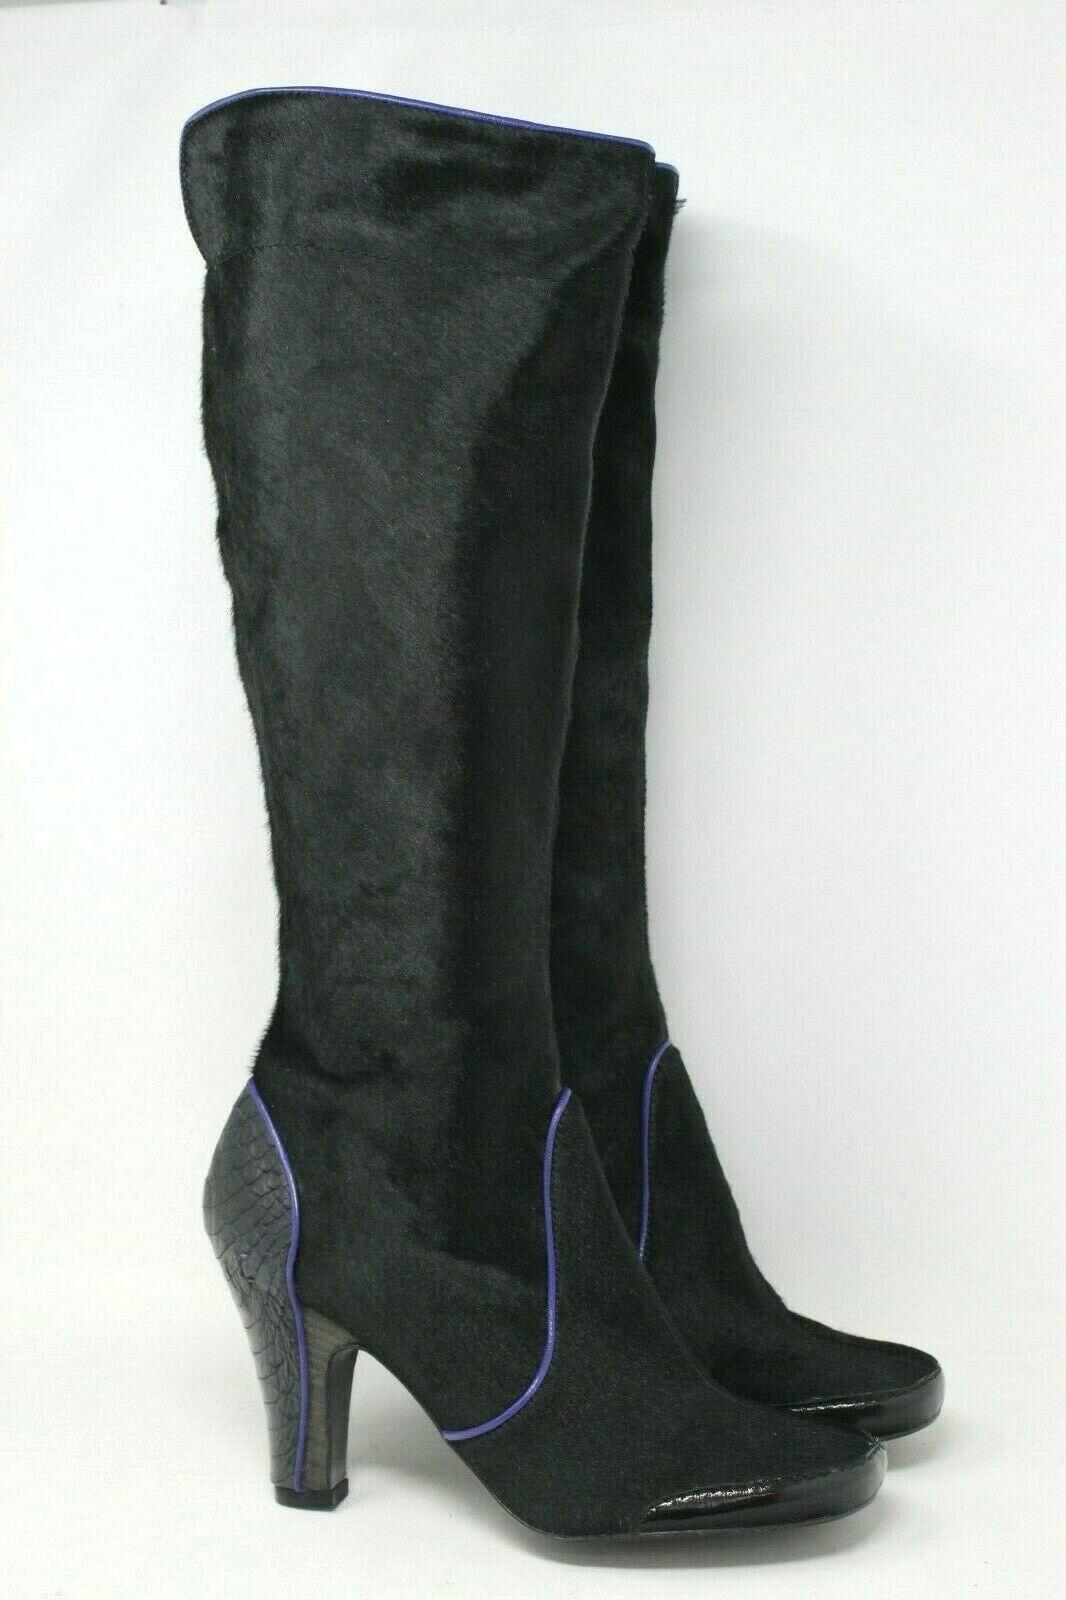 BCBGMAXAZRIA Calf Hair Knee High Boot in Black Size  40 NEW